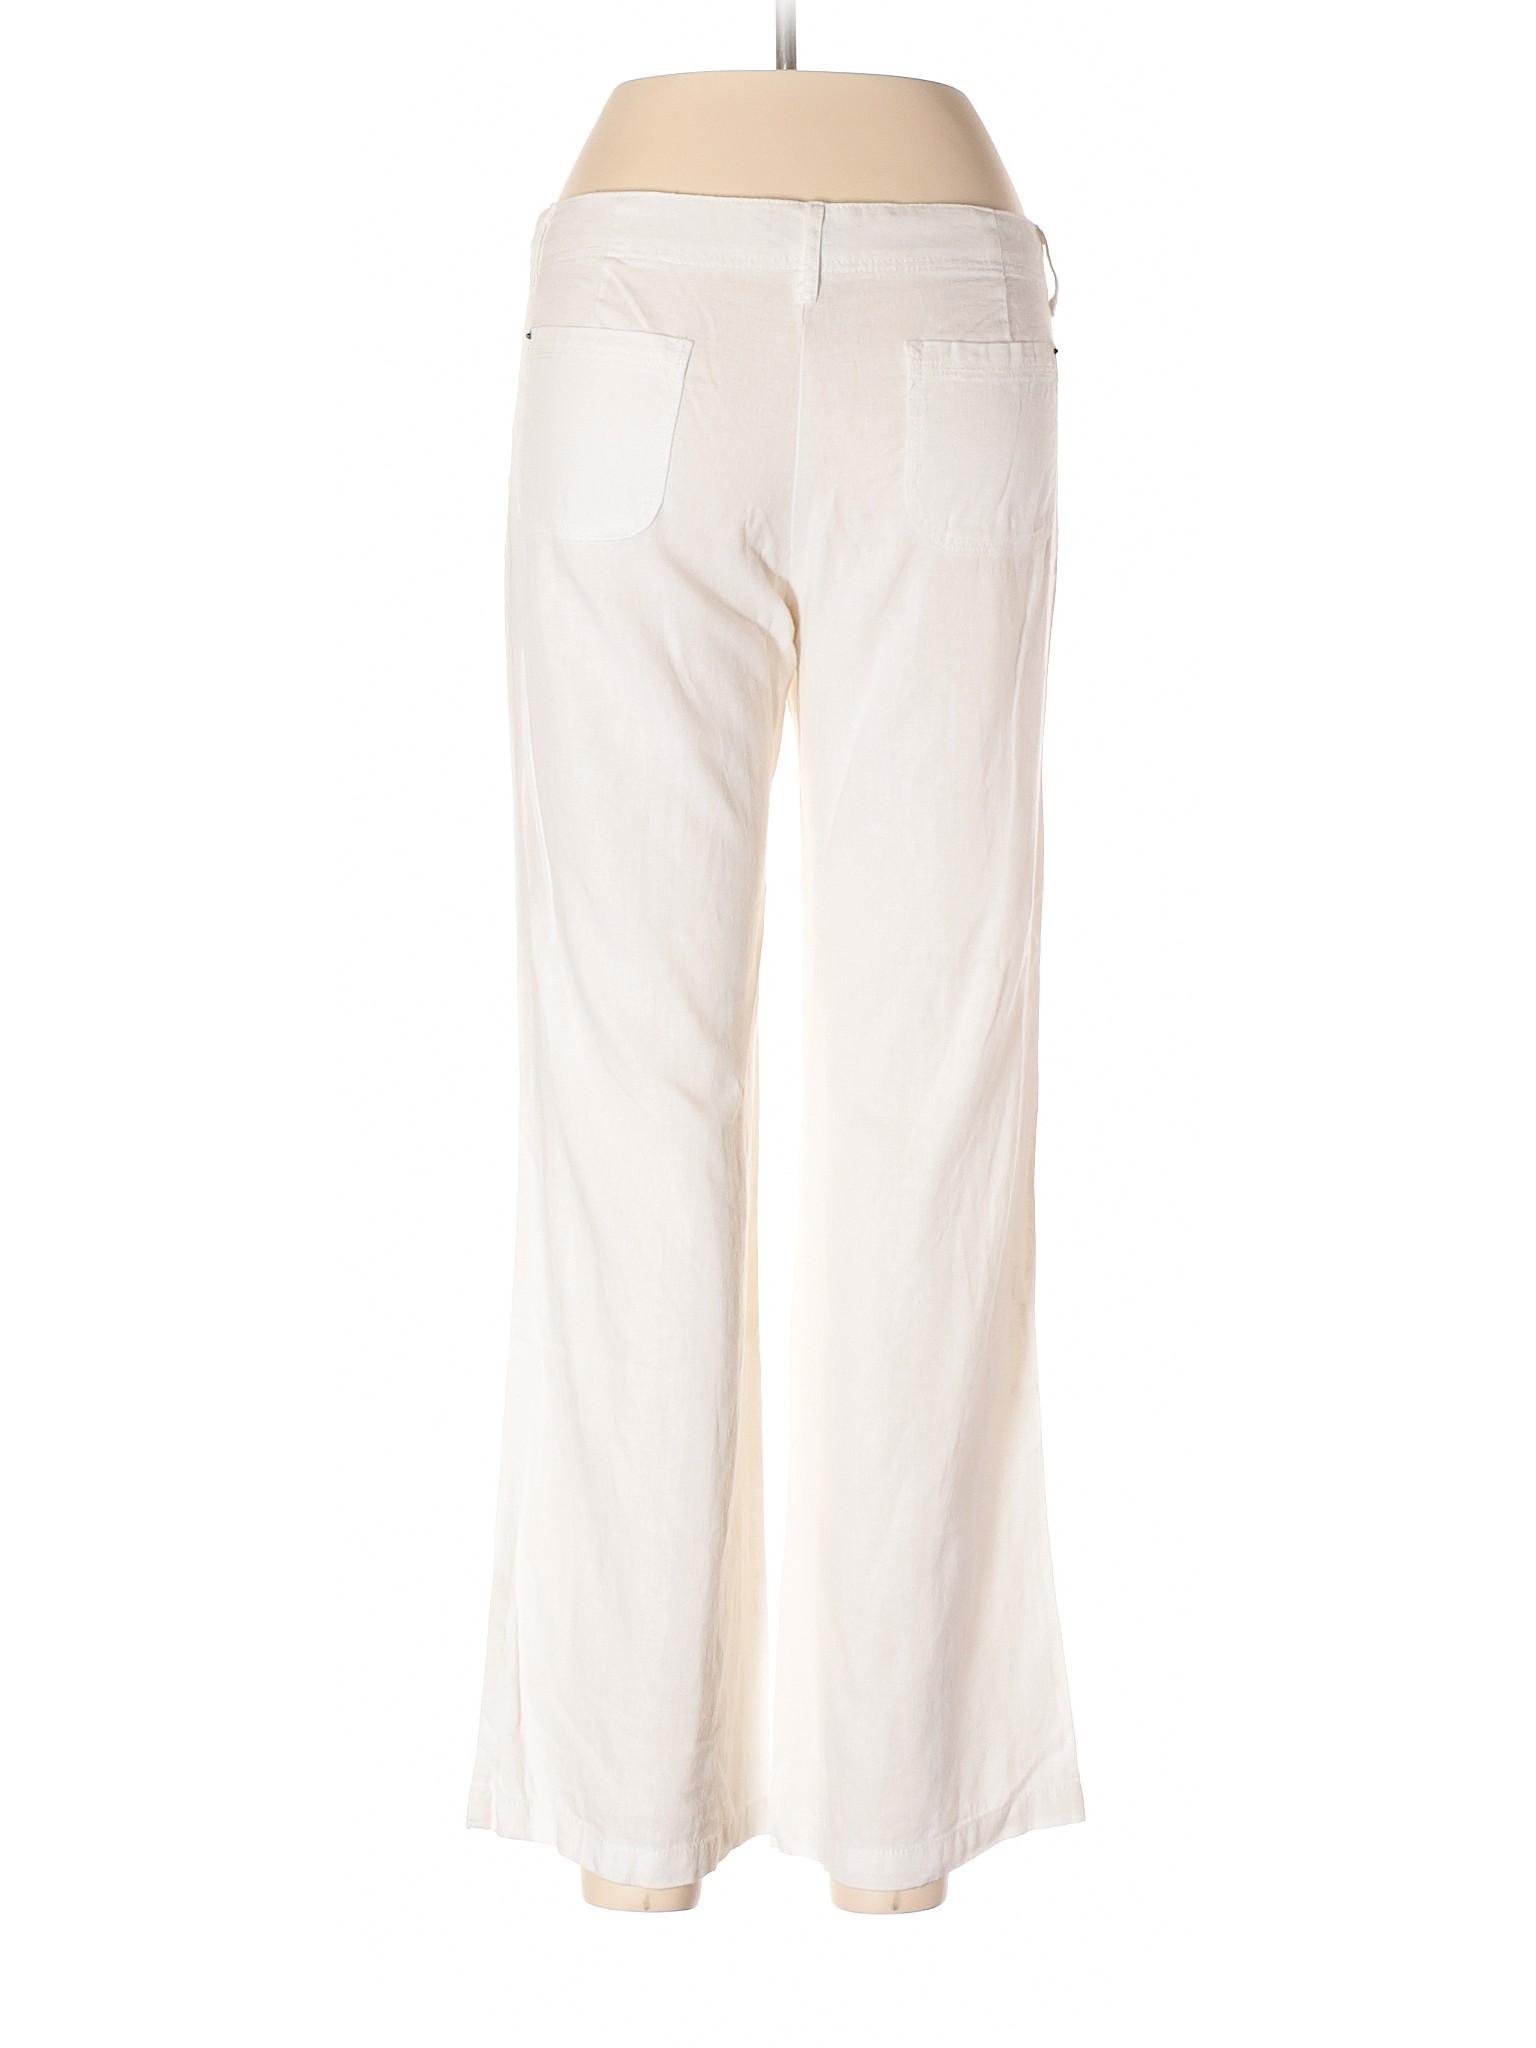 Pants Sono Ci leisure Boutique Linen IvO7Uqwn